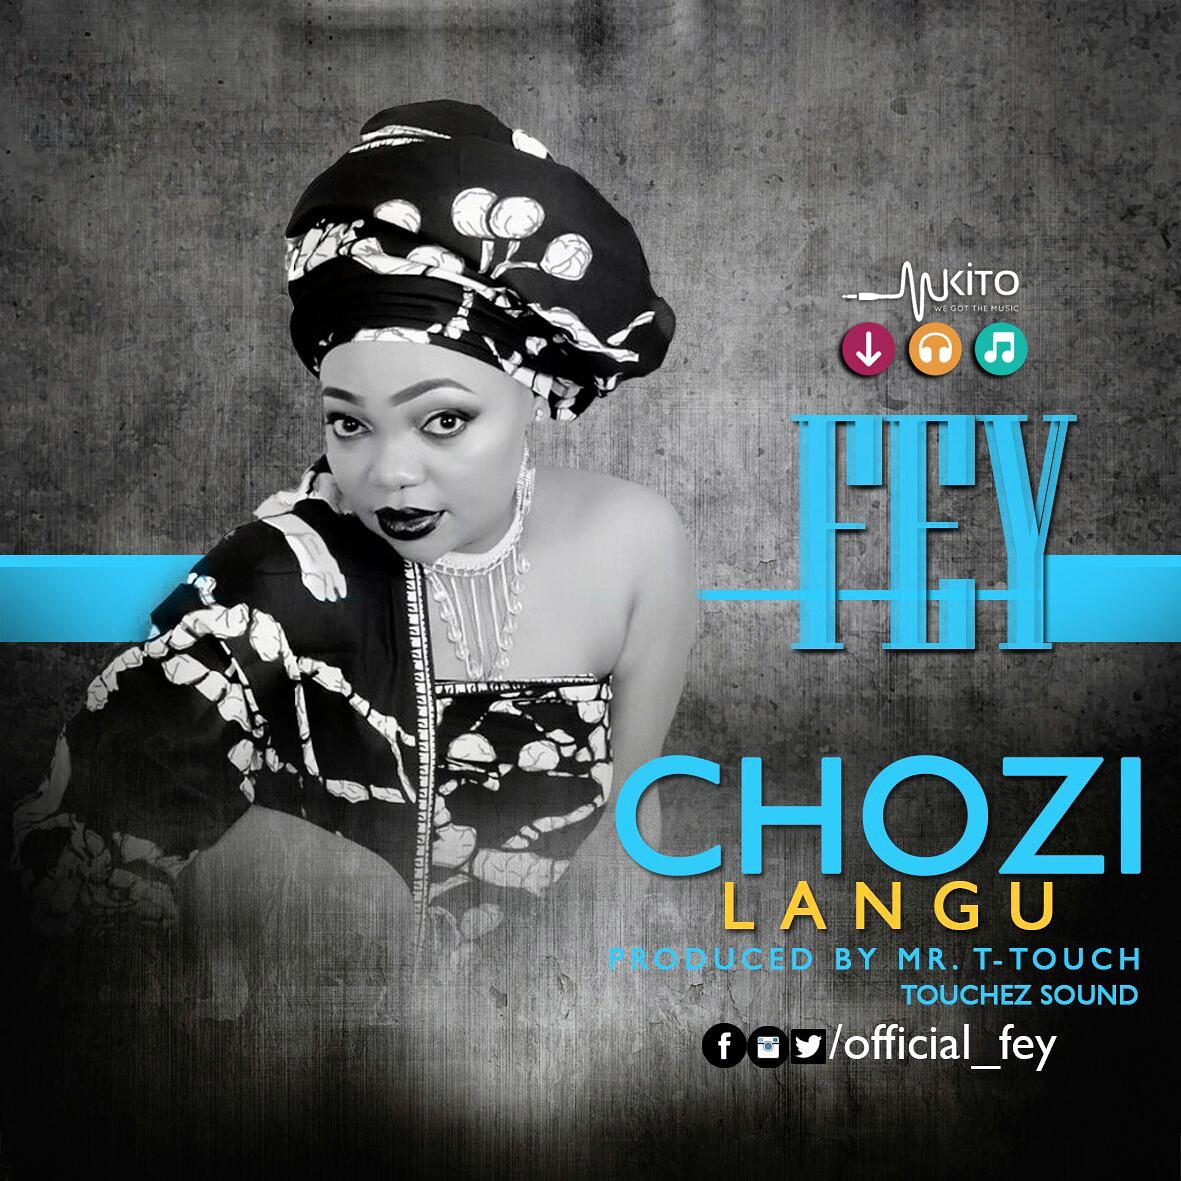 Fey - Chozi langu